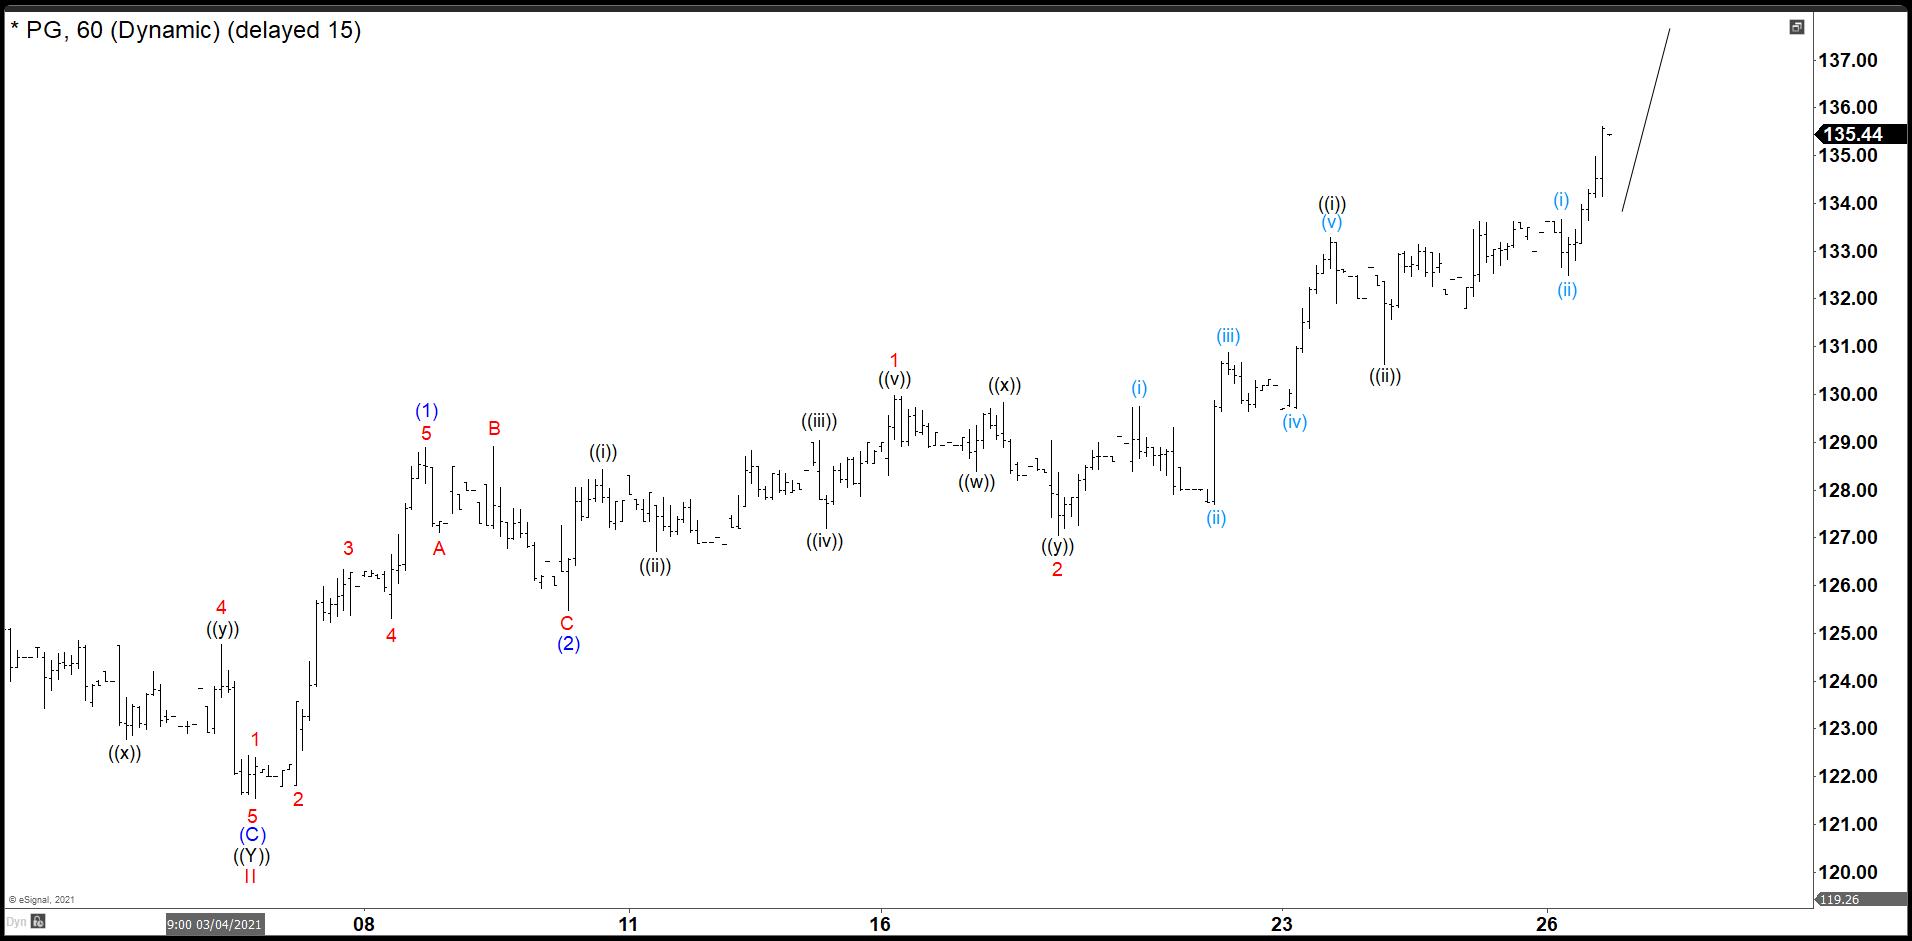 P&G 30 minutes Chart